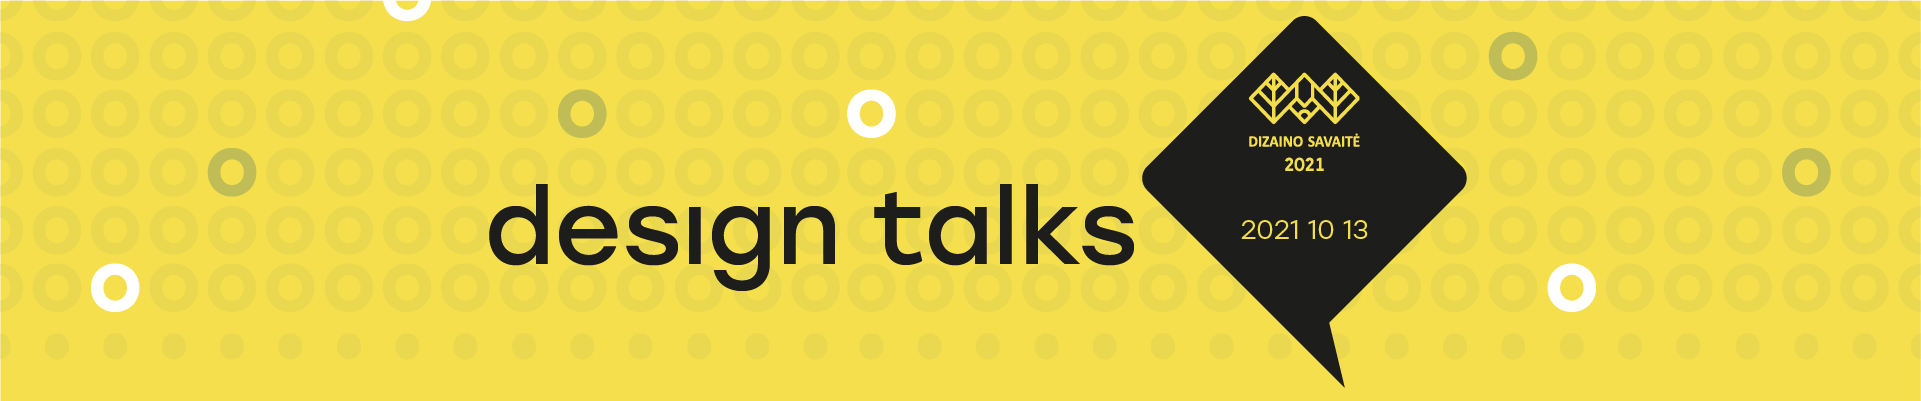 Design Talks tarptautinė konferencija